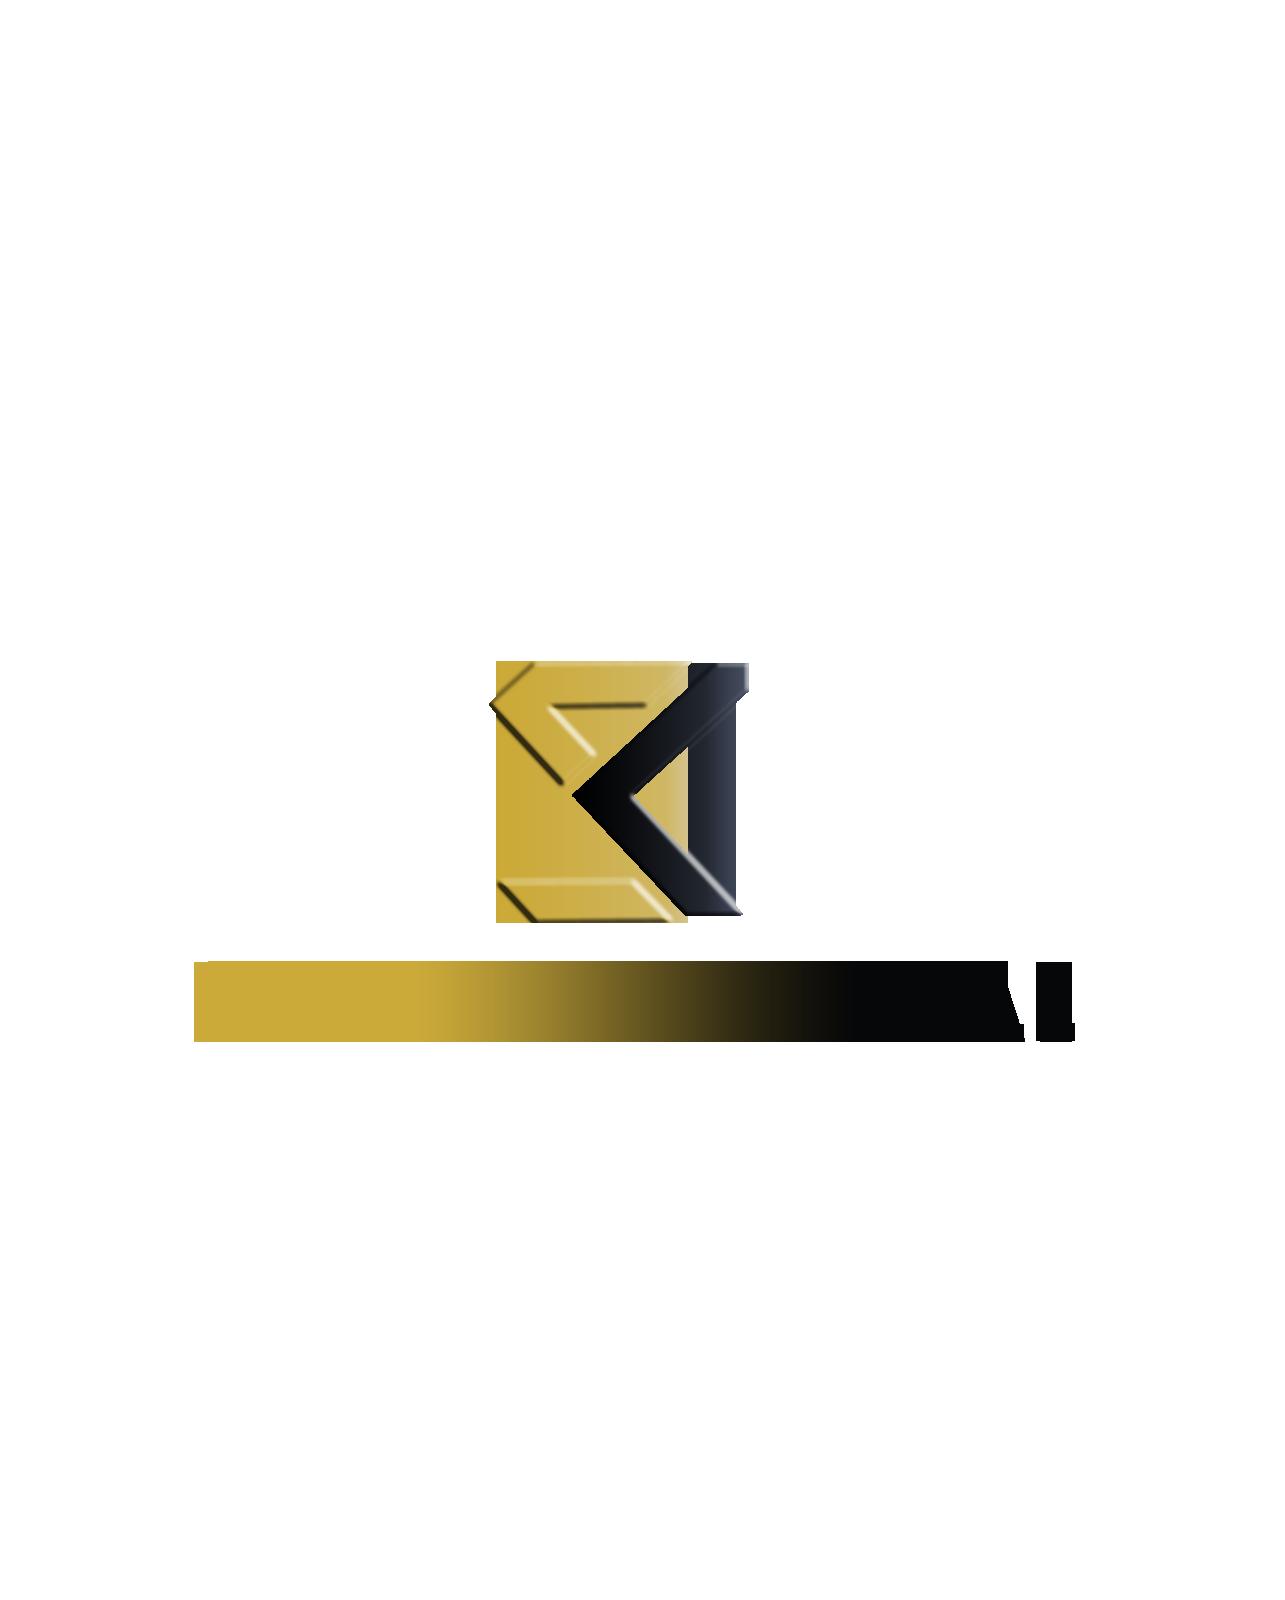 S.K INTERNATIONAL TRADING CO. (INDIA)